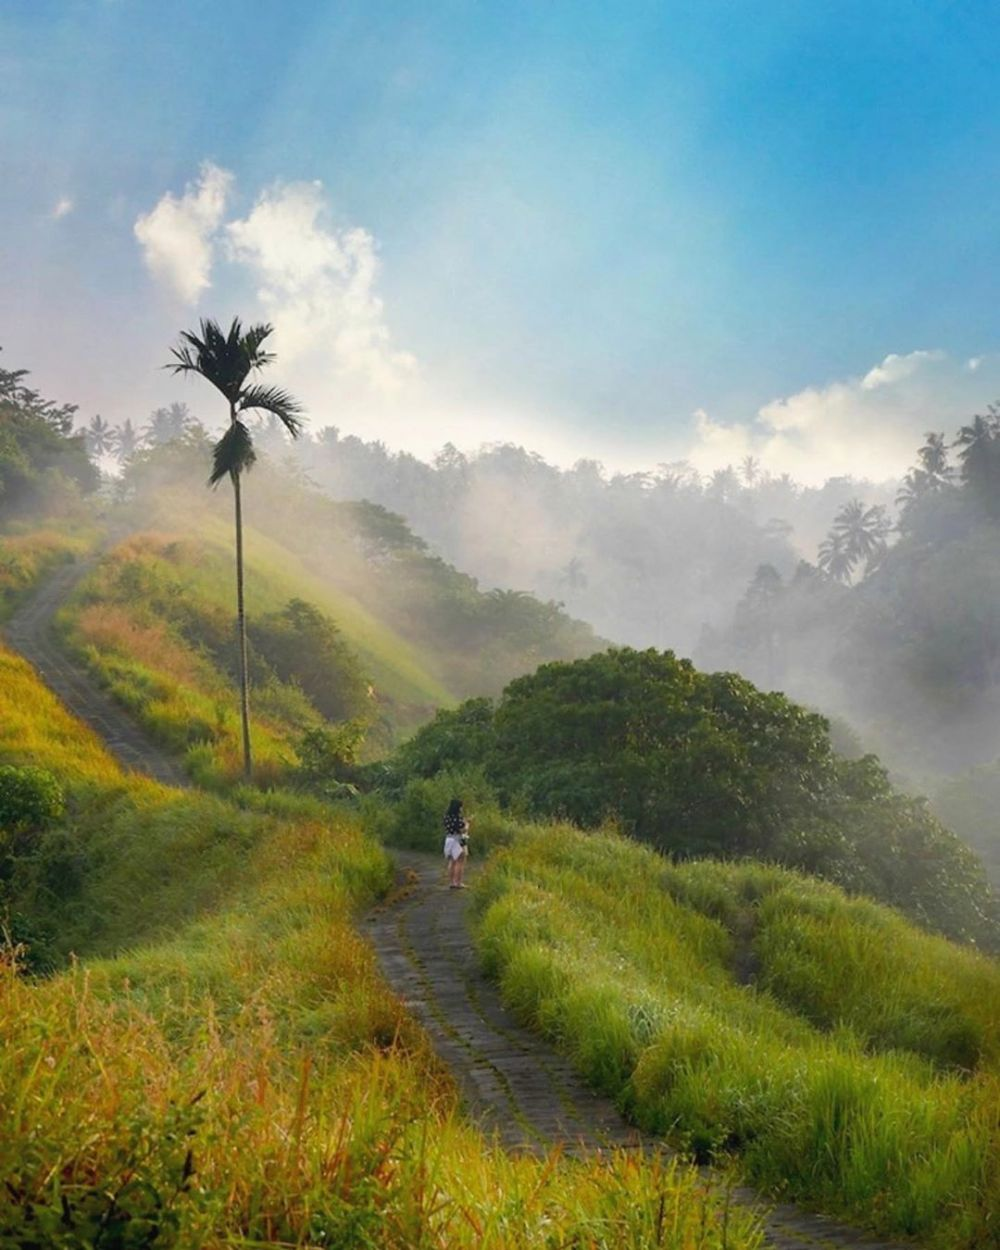 Tempat wisata gratis di Bali © 2019 brilio.net